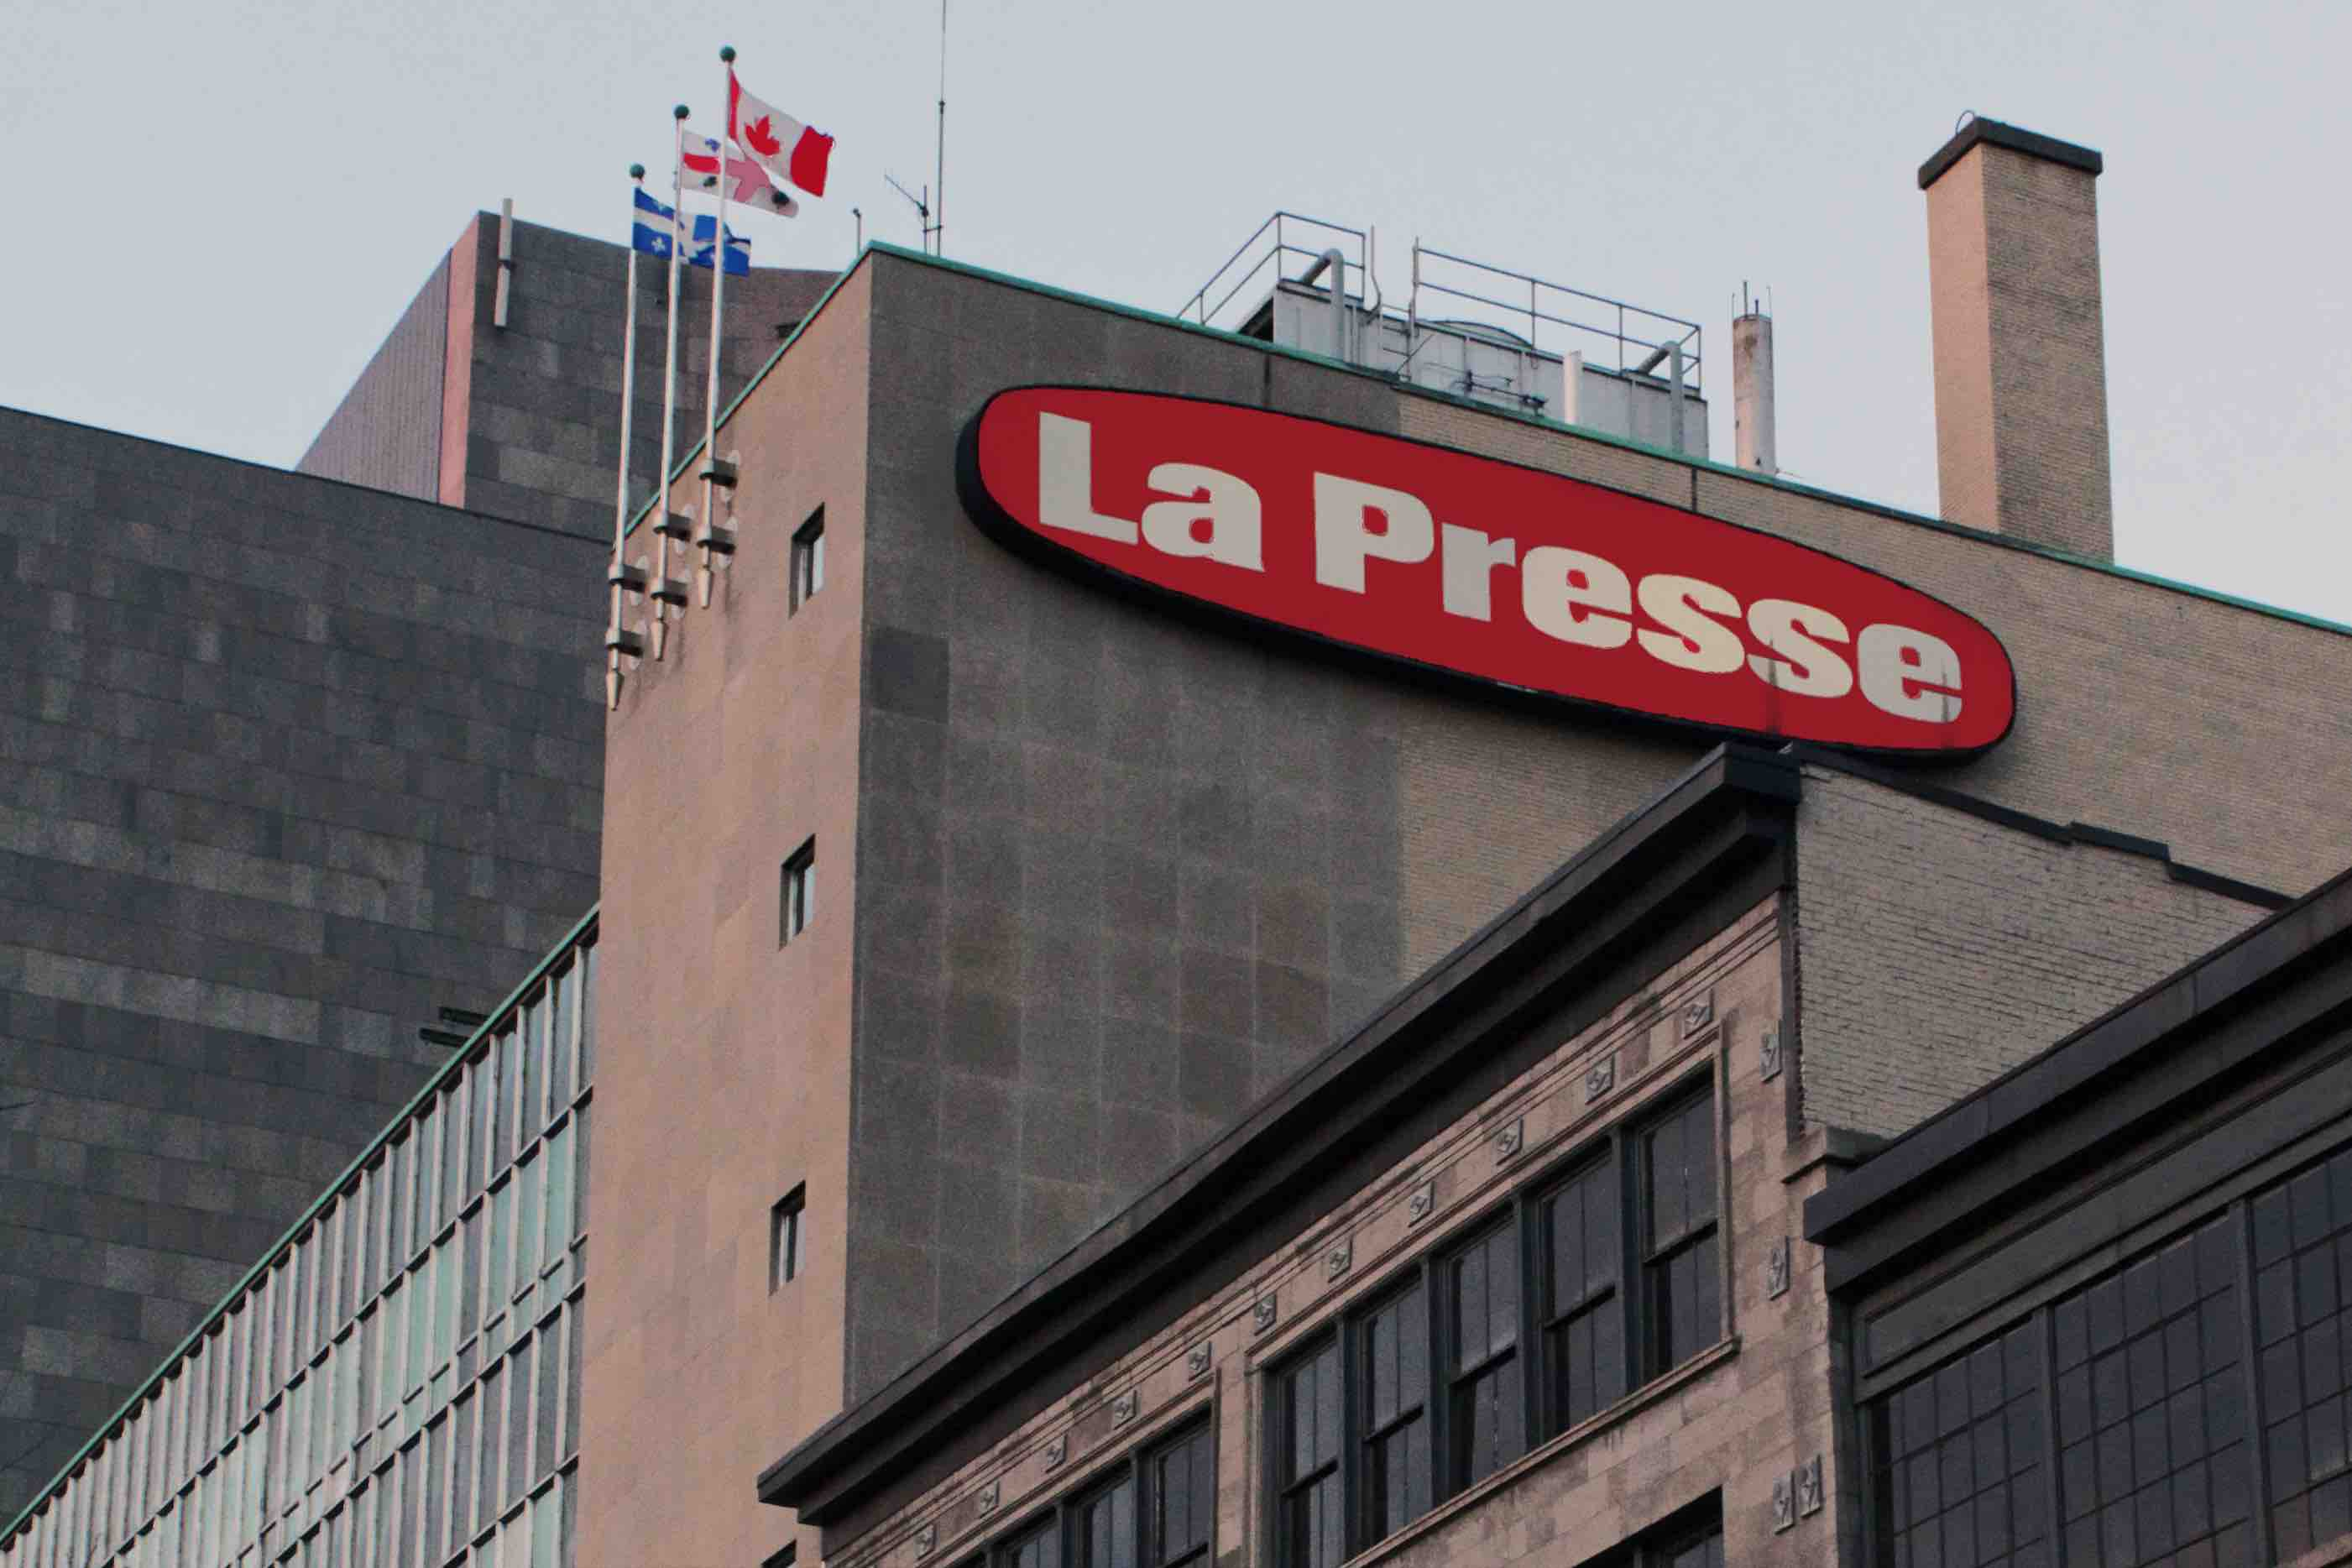 La_Presse - copie